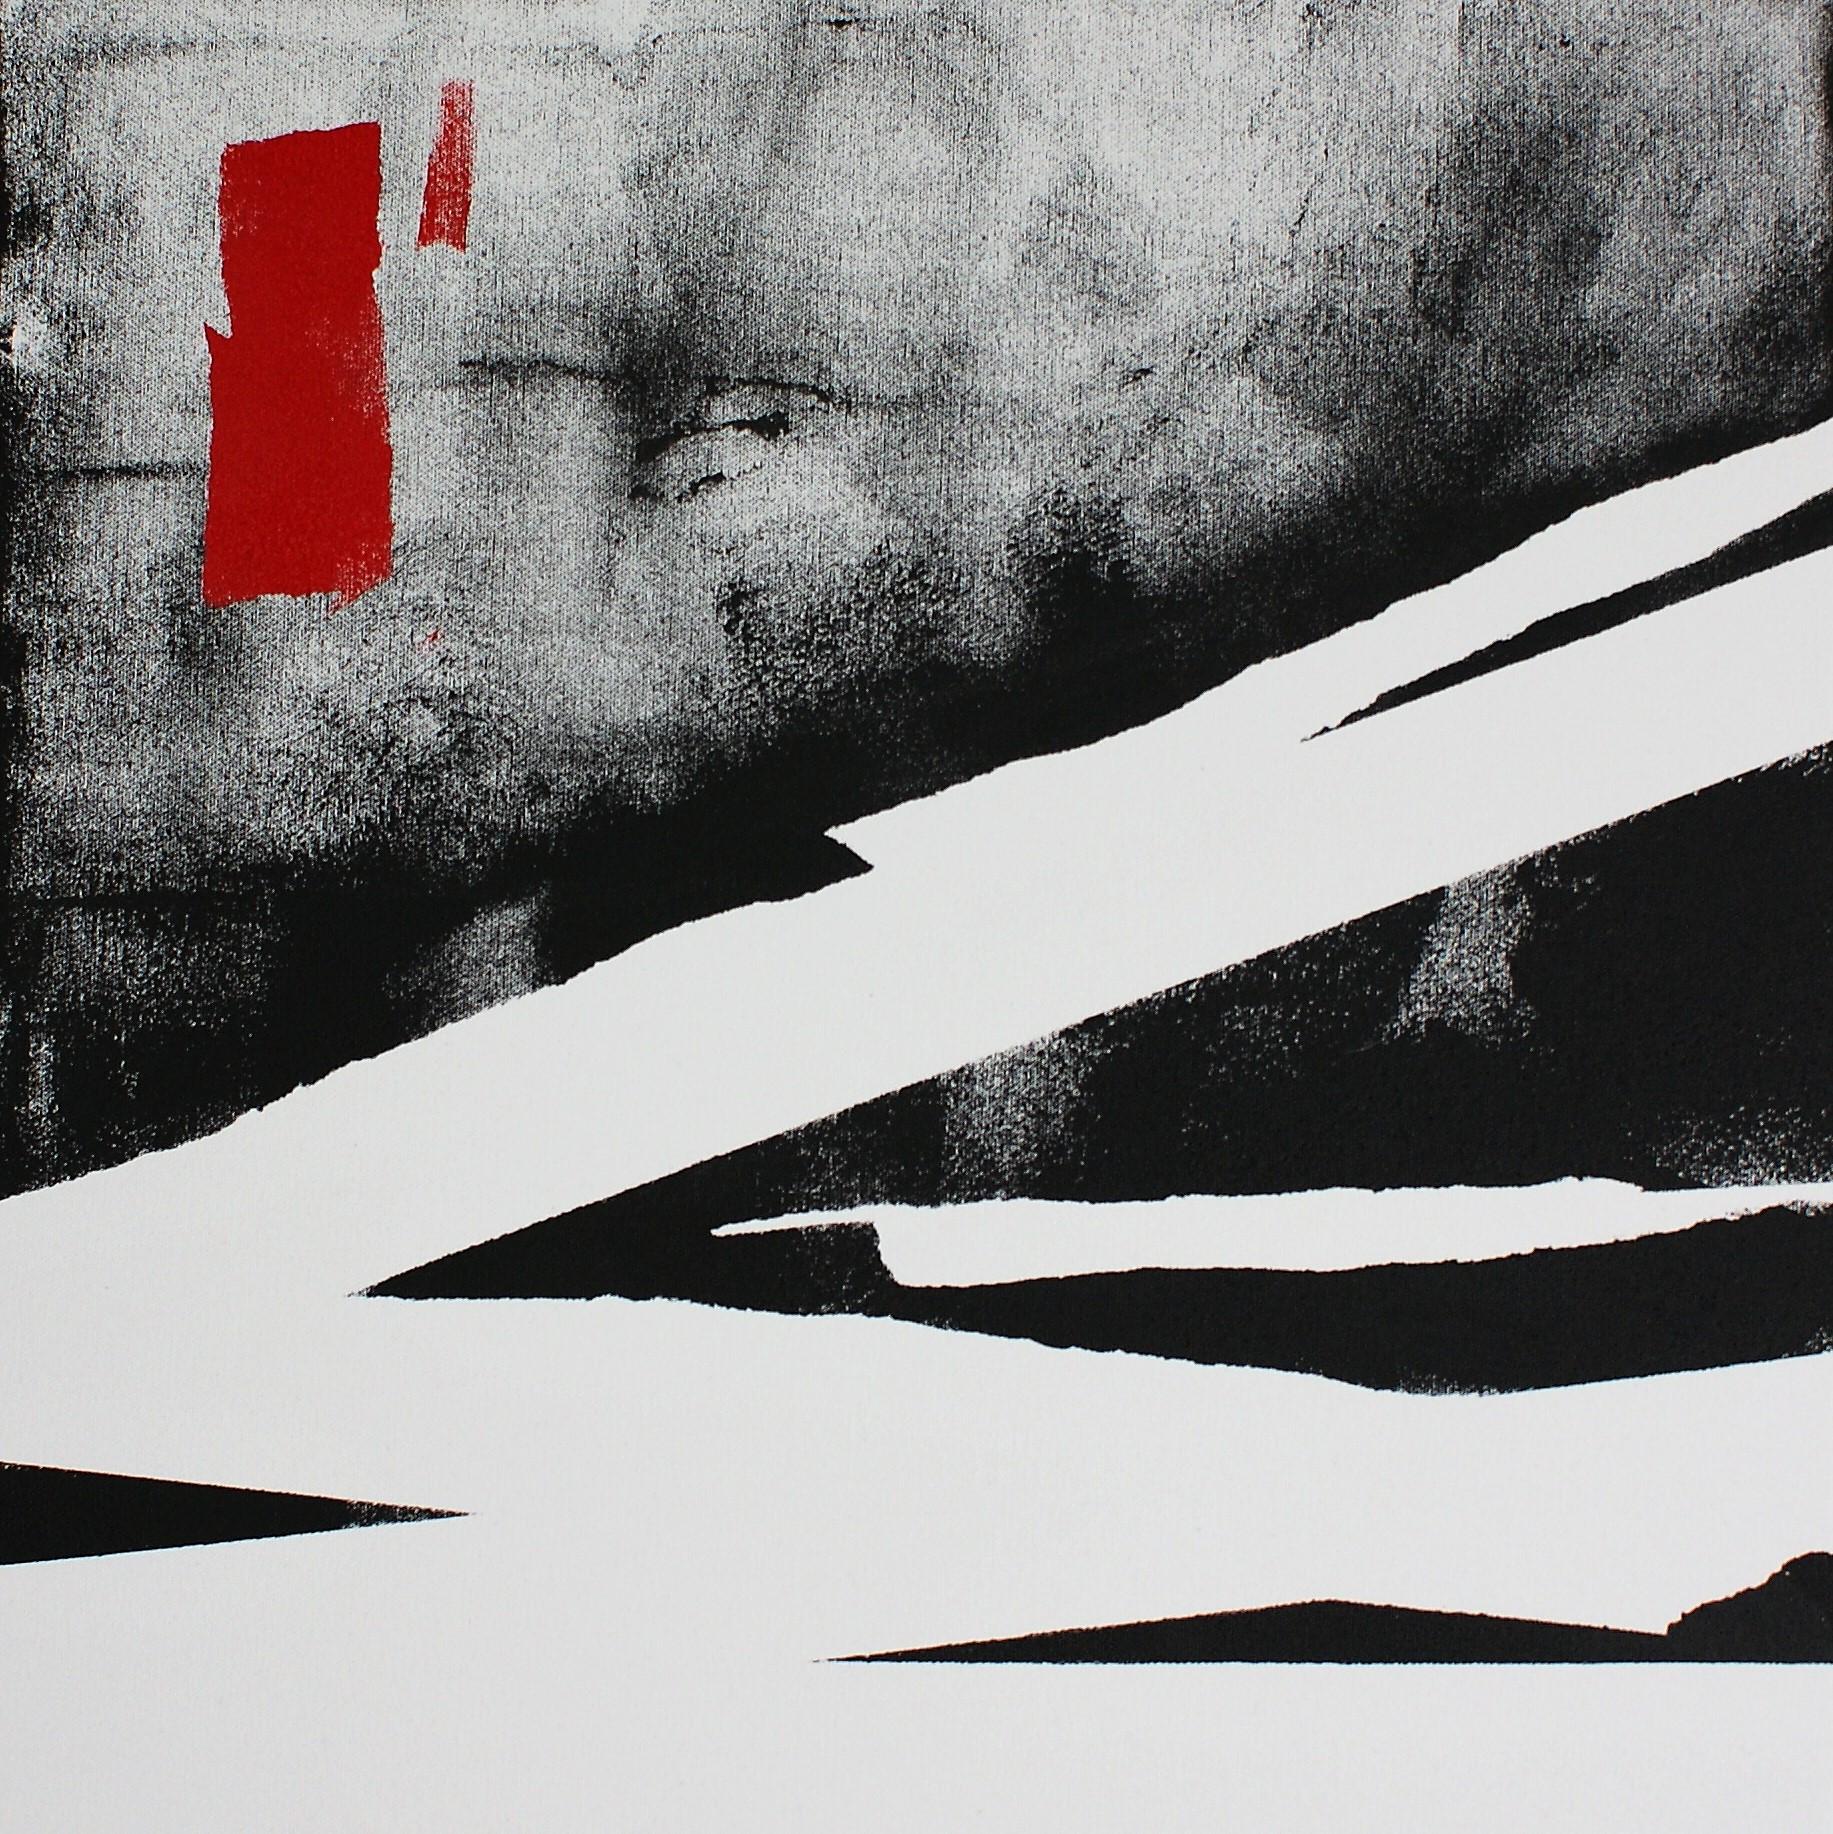 Bandage (acrylic & oil on canvas, 50x50cm) 2018 DBrewins-Cook